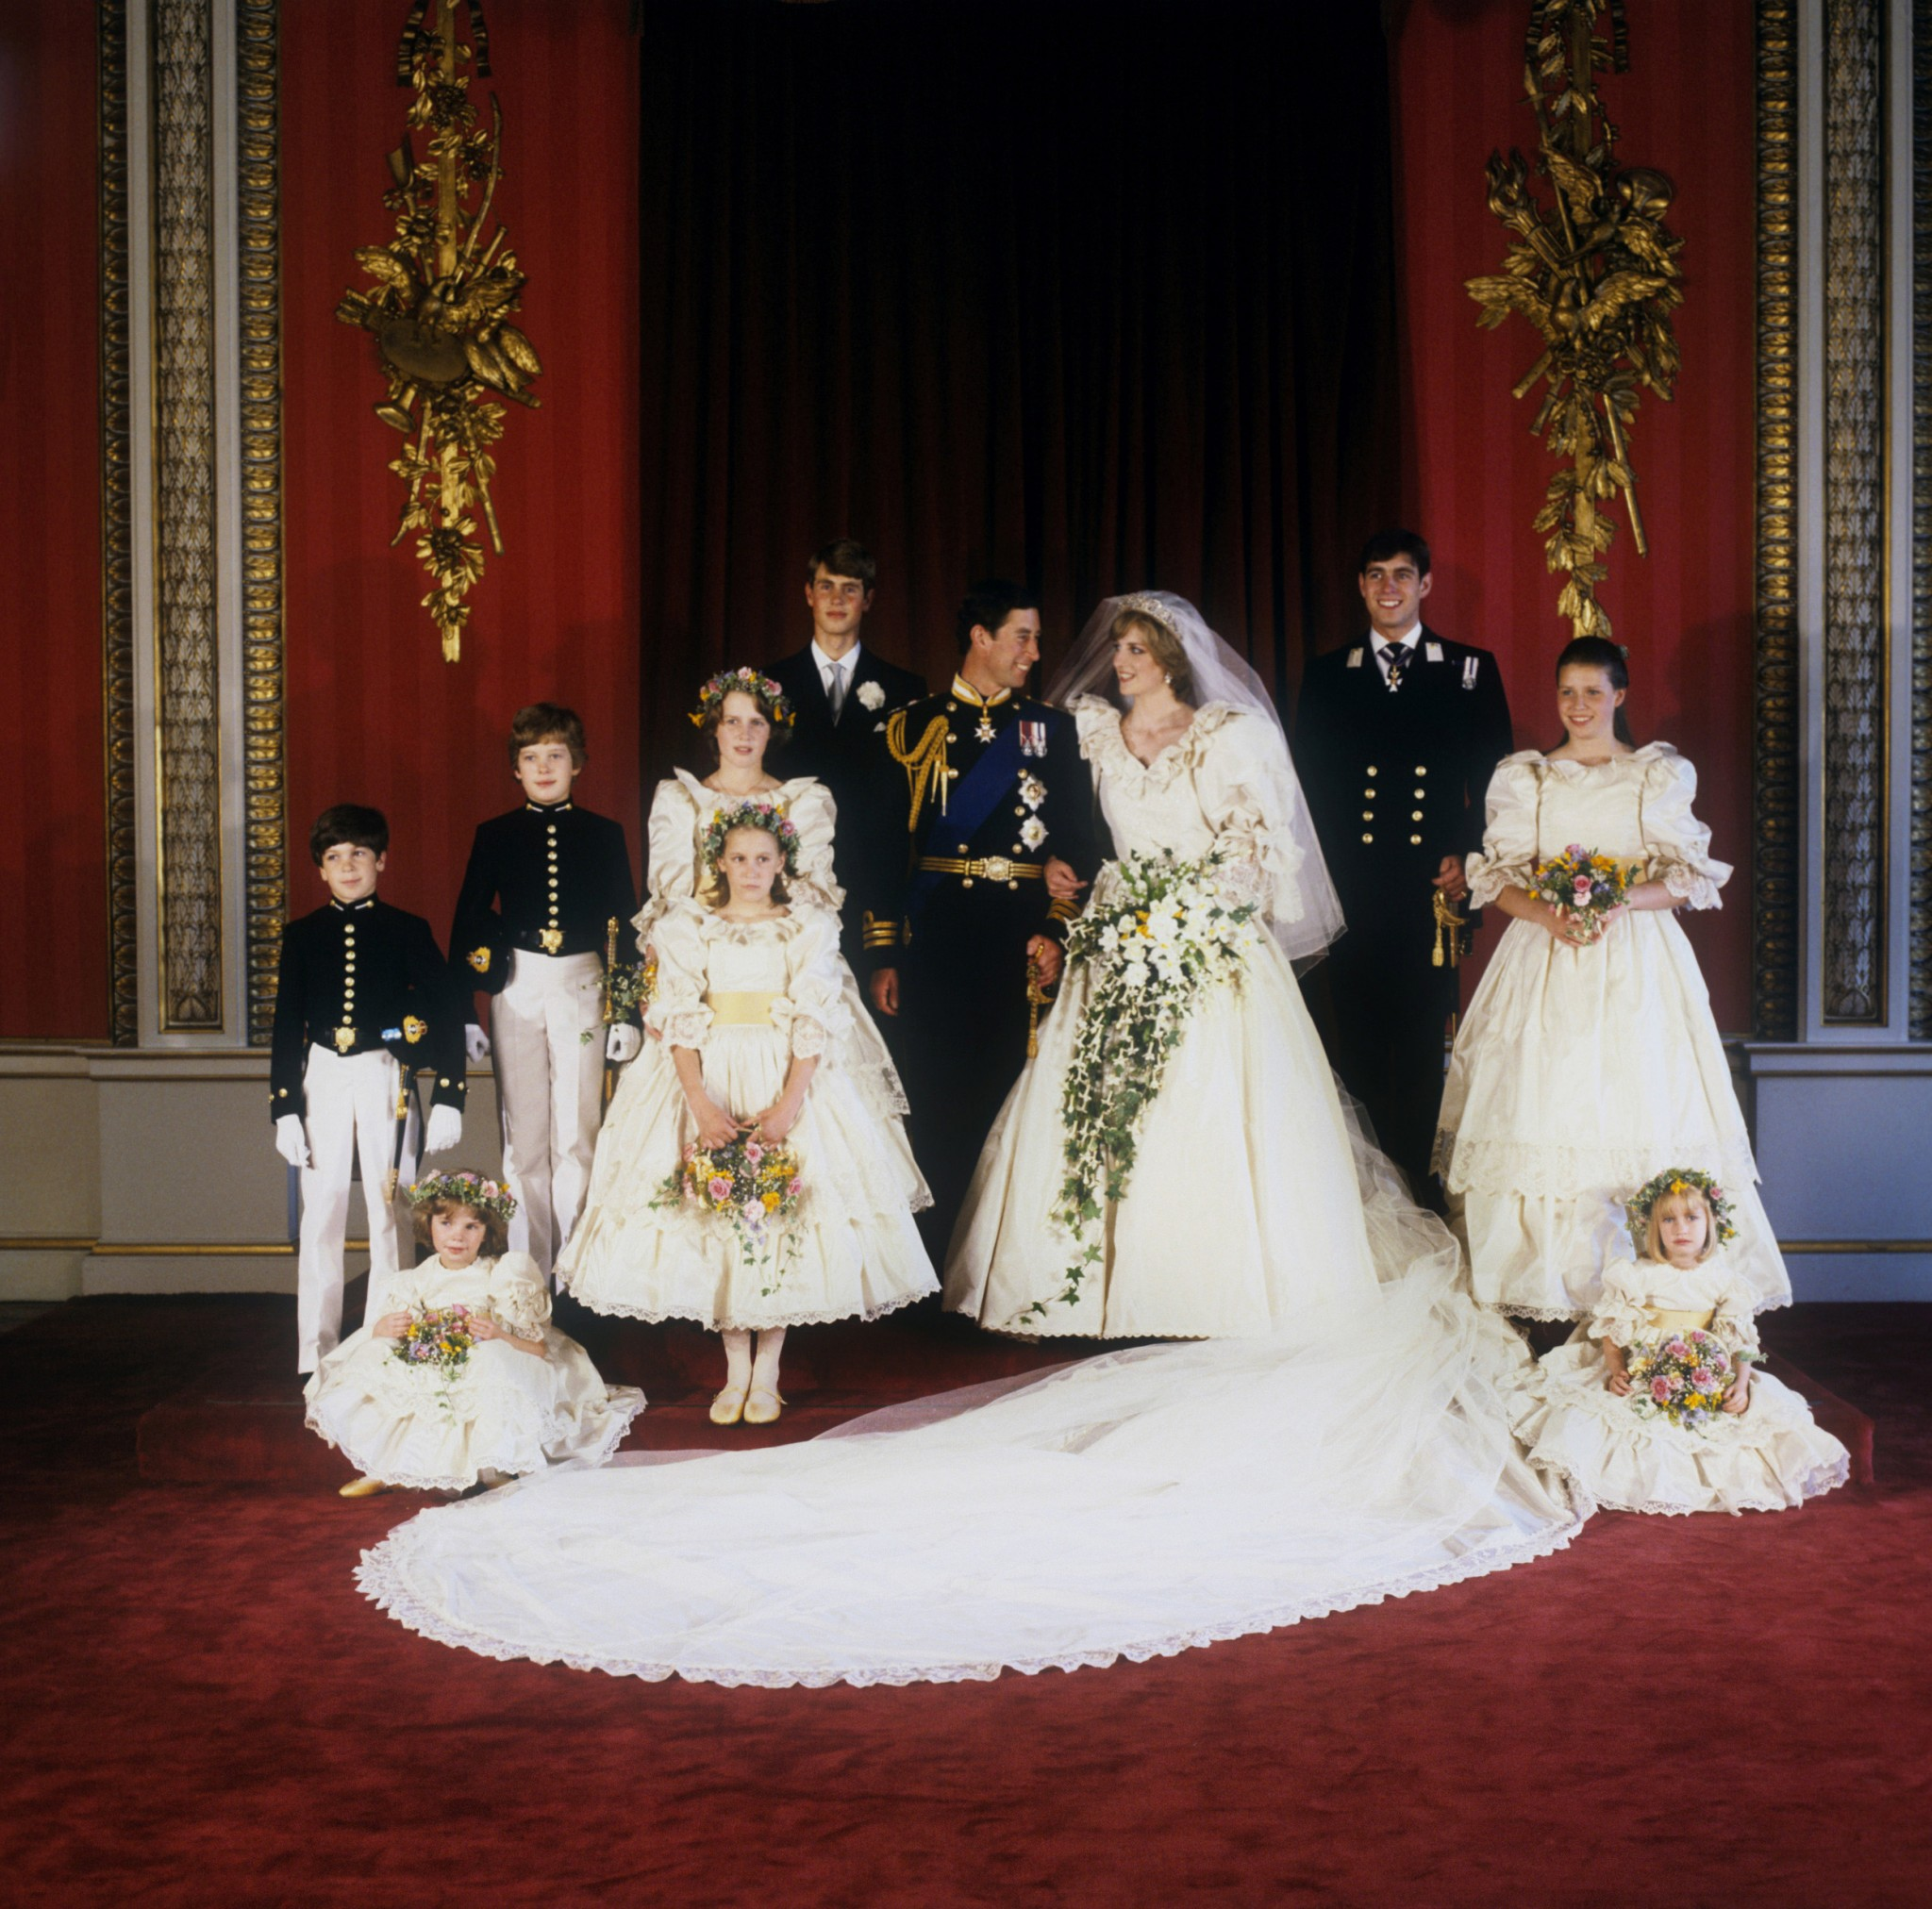 Prince Charles And Lady Diana Wedding Cake